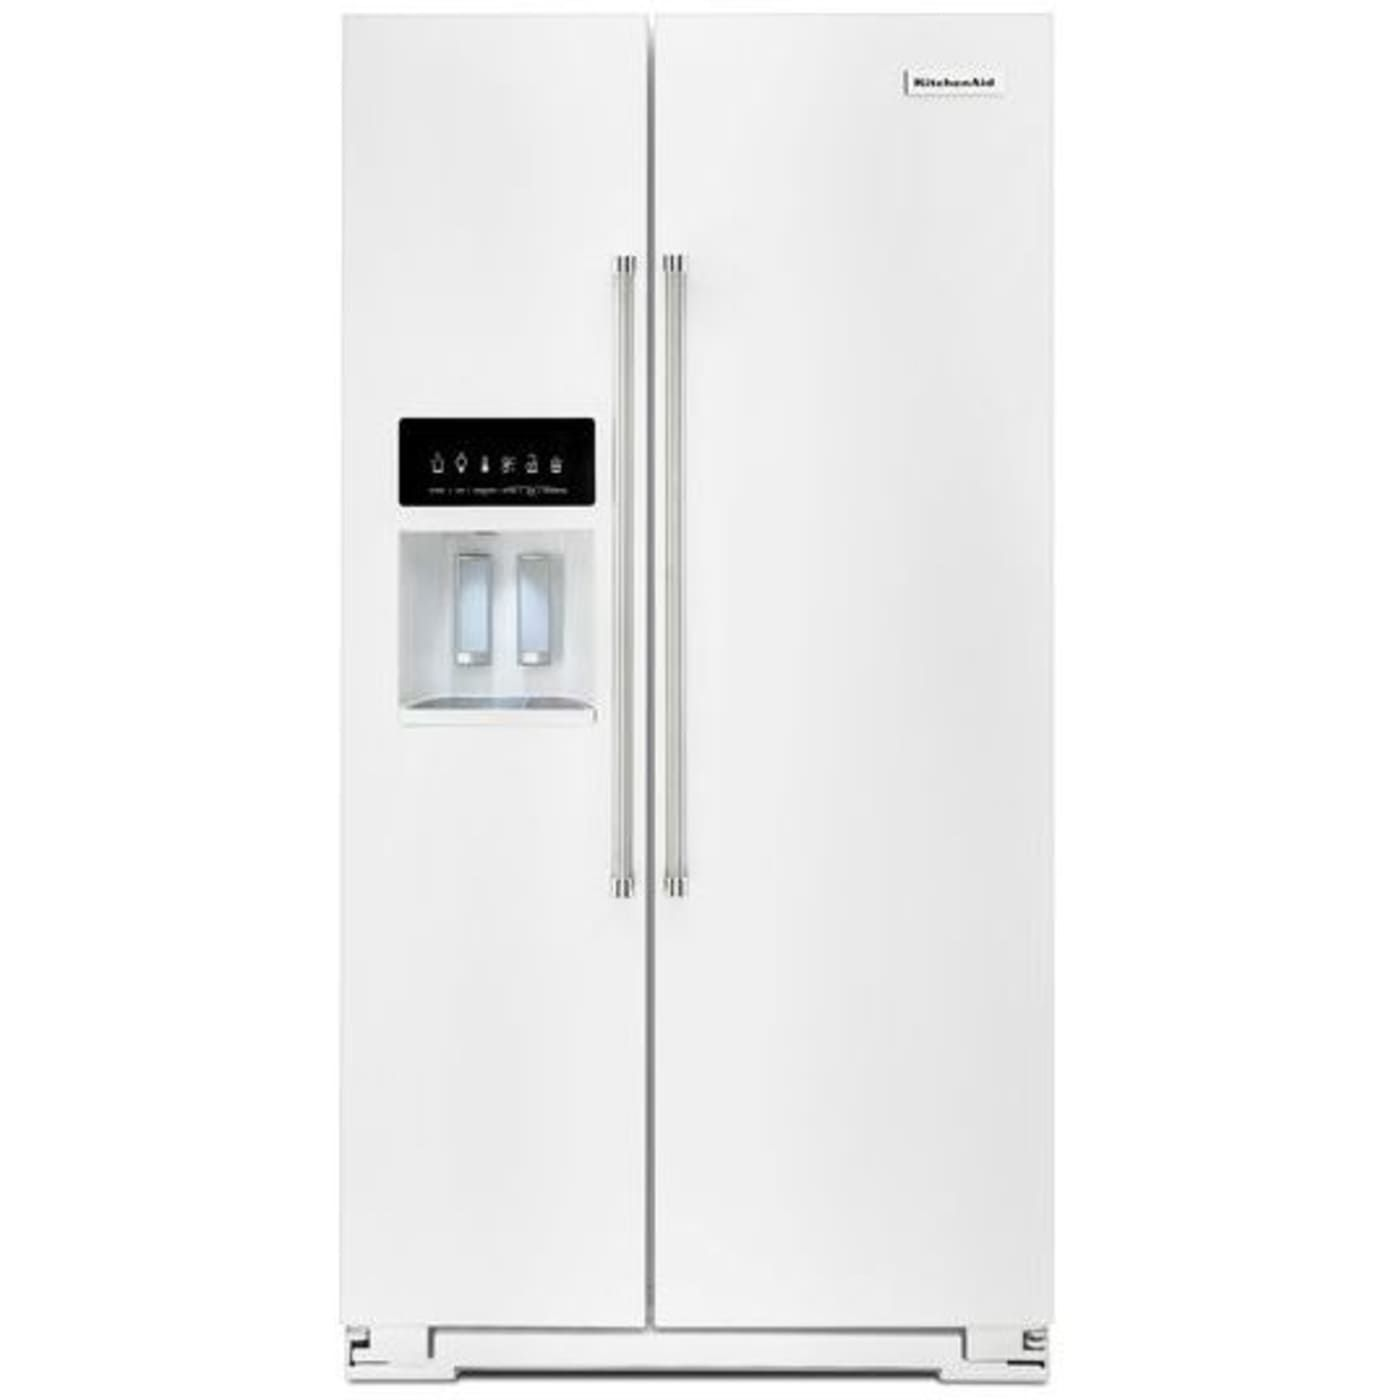 Krsf505ewh by kitchenaid sidebyside refrigerators